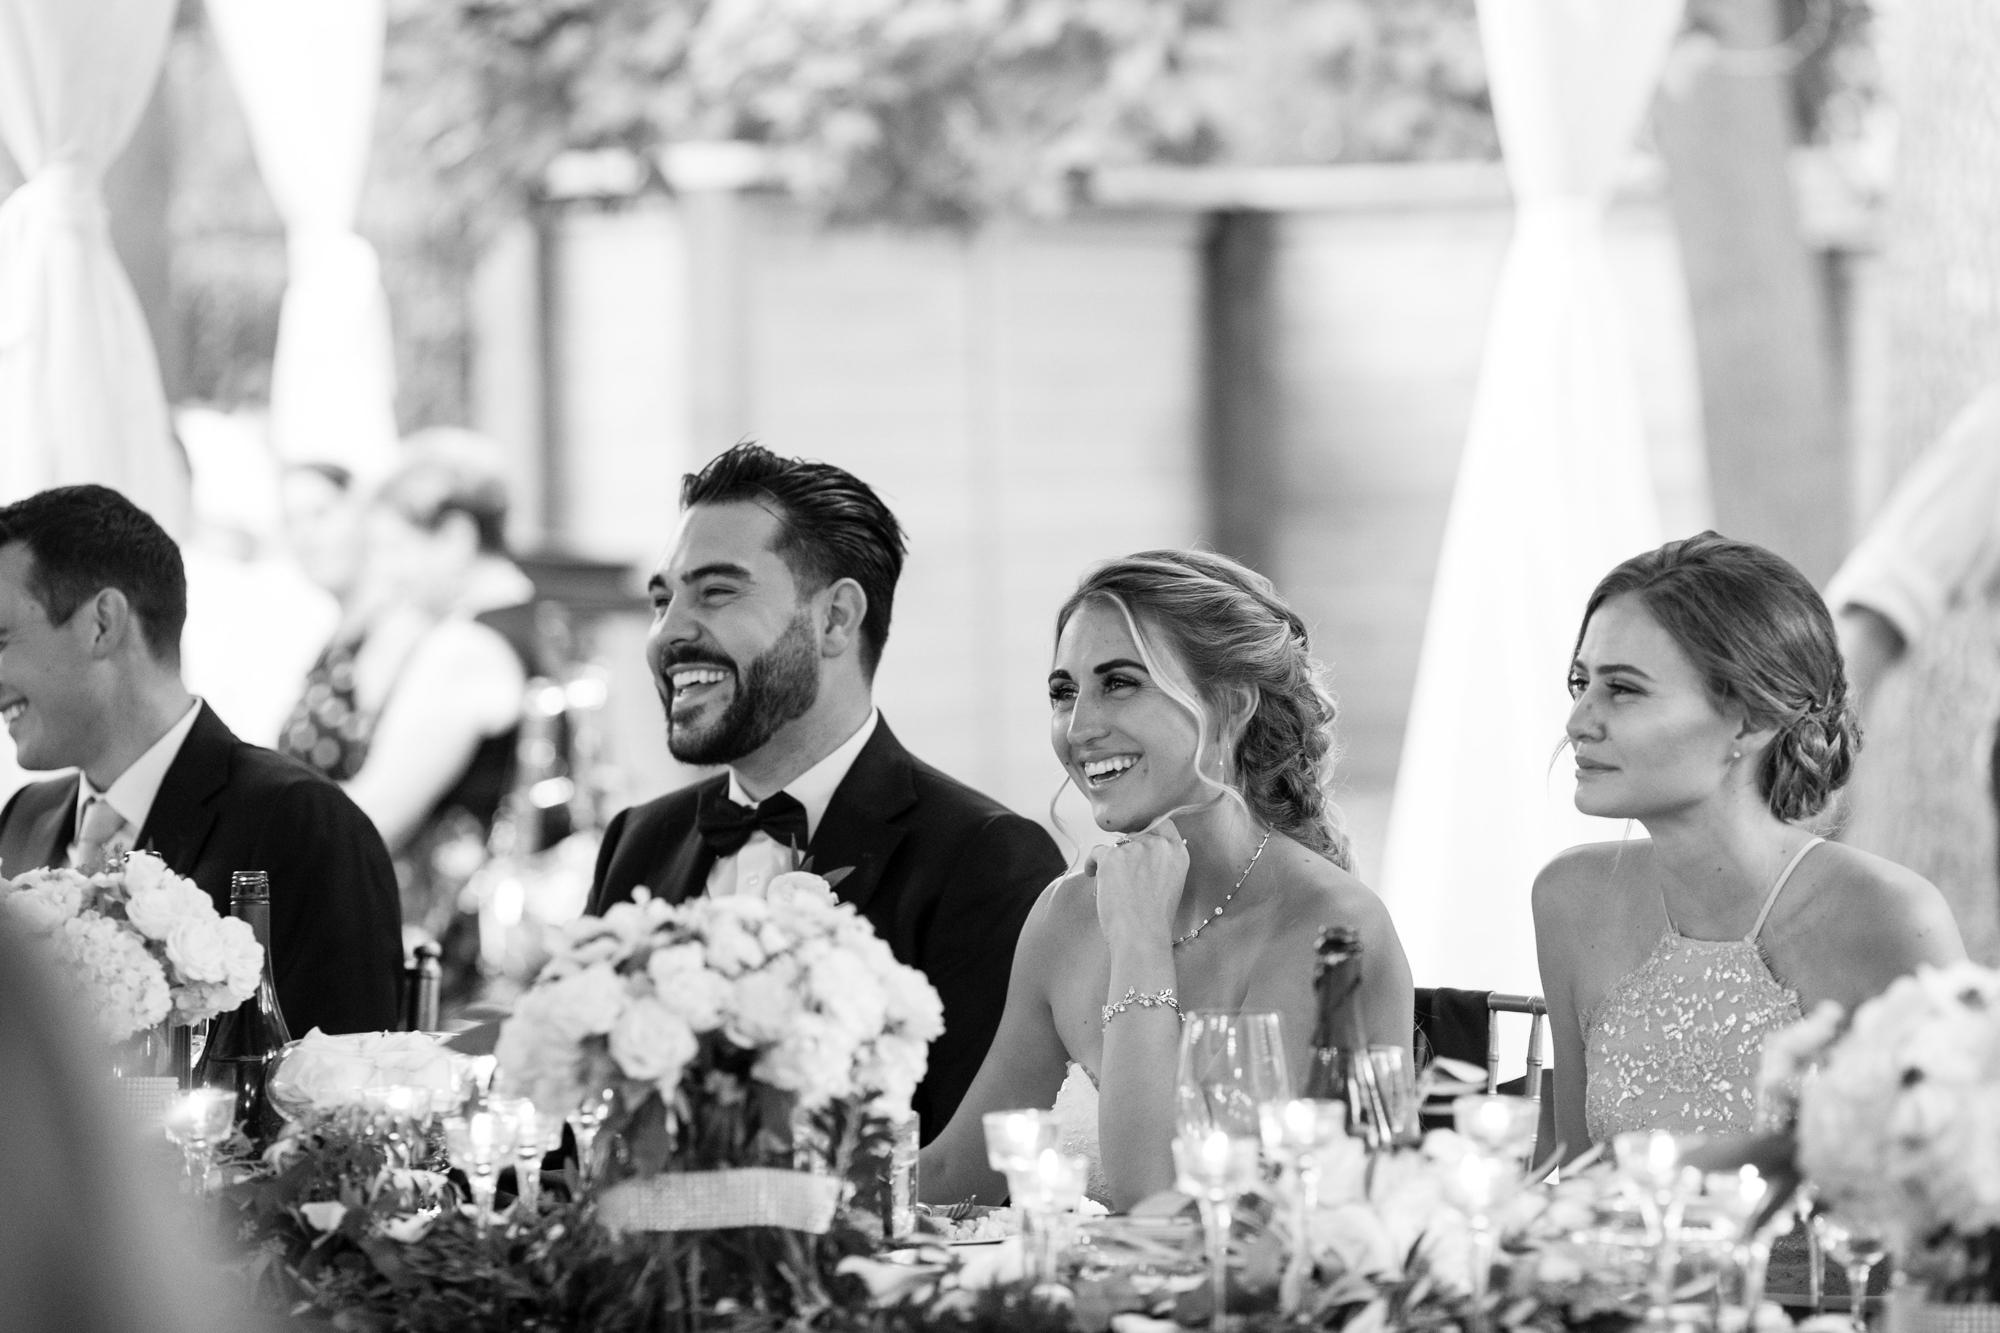 greek-wedding-salt-lake-city-utah-45.jpg